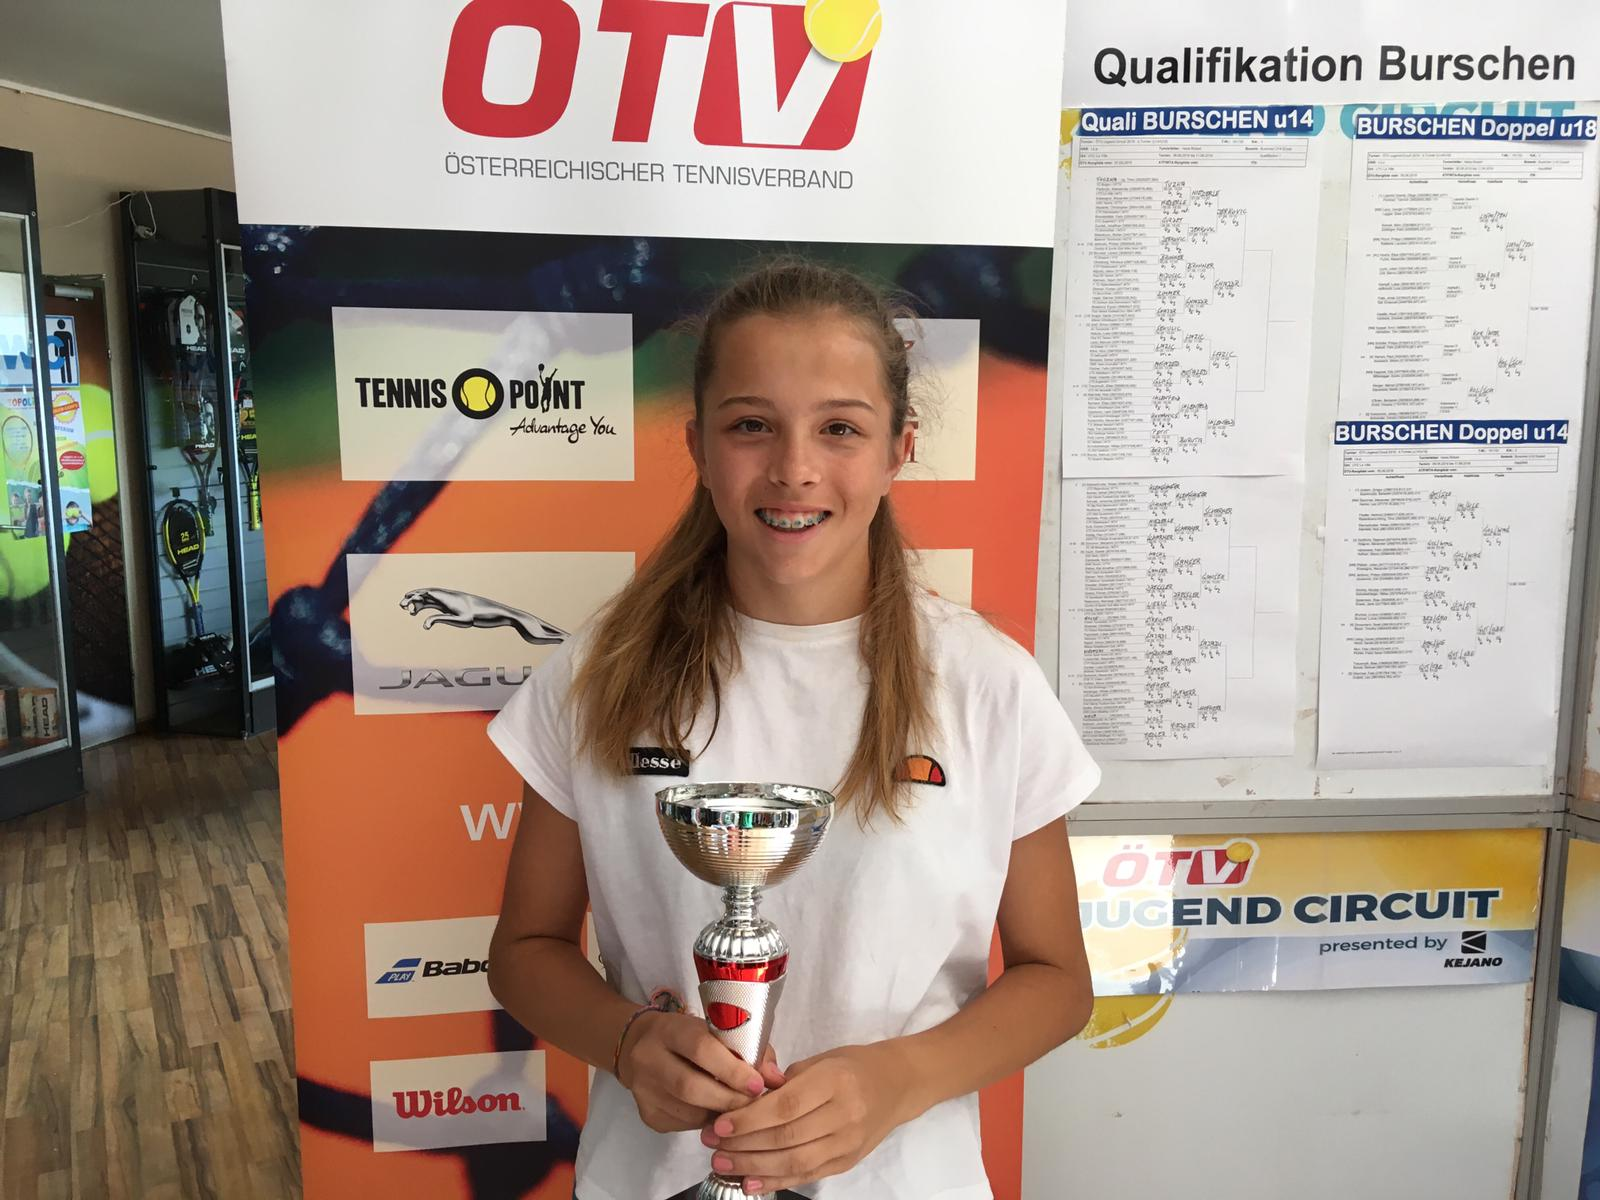 Emma ÖTV Jugendcircuit 5. Turnier, La Ville Wien 8. – 11. Juni 2019